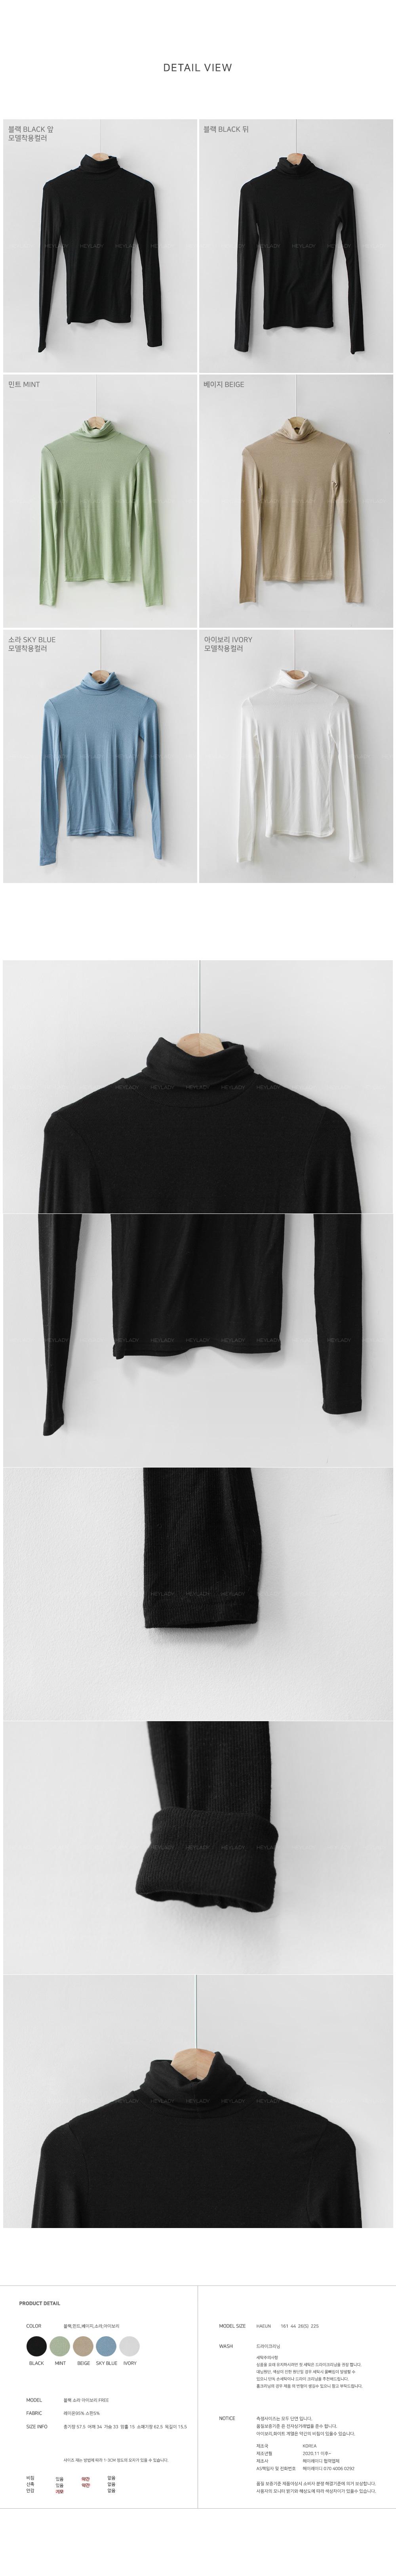 Dearley Ribbed Turtleneck T-shirt